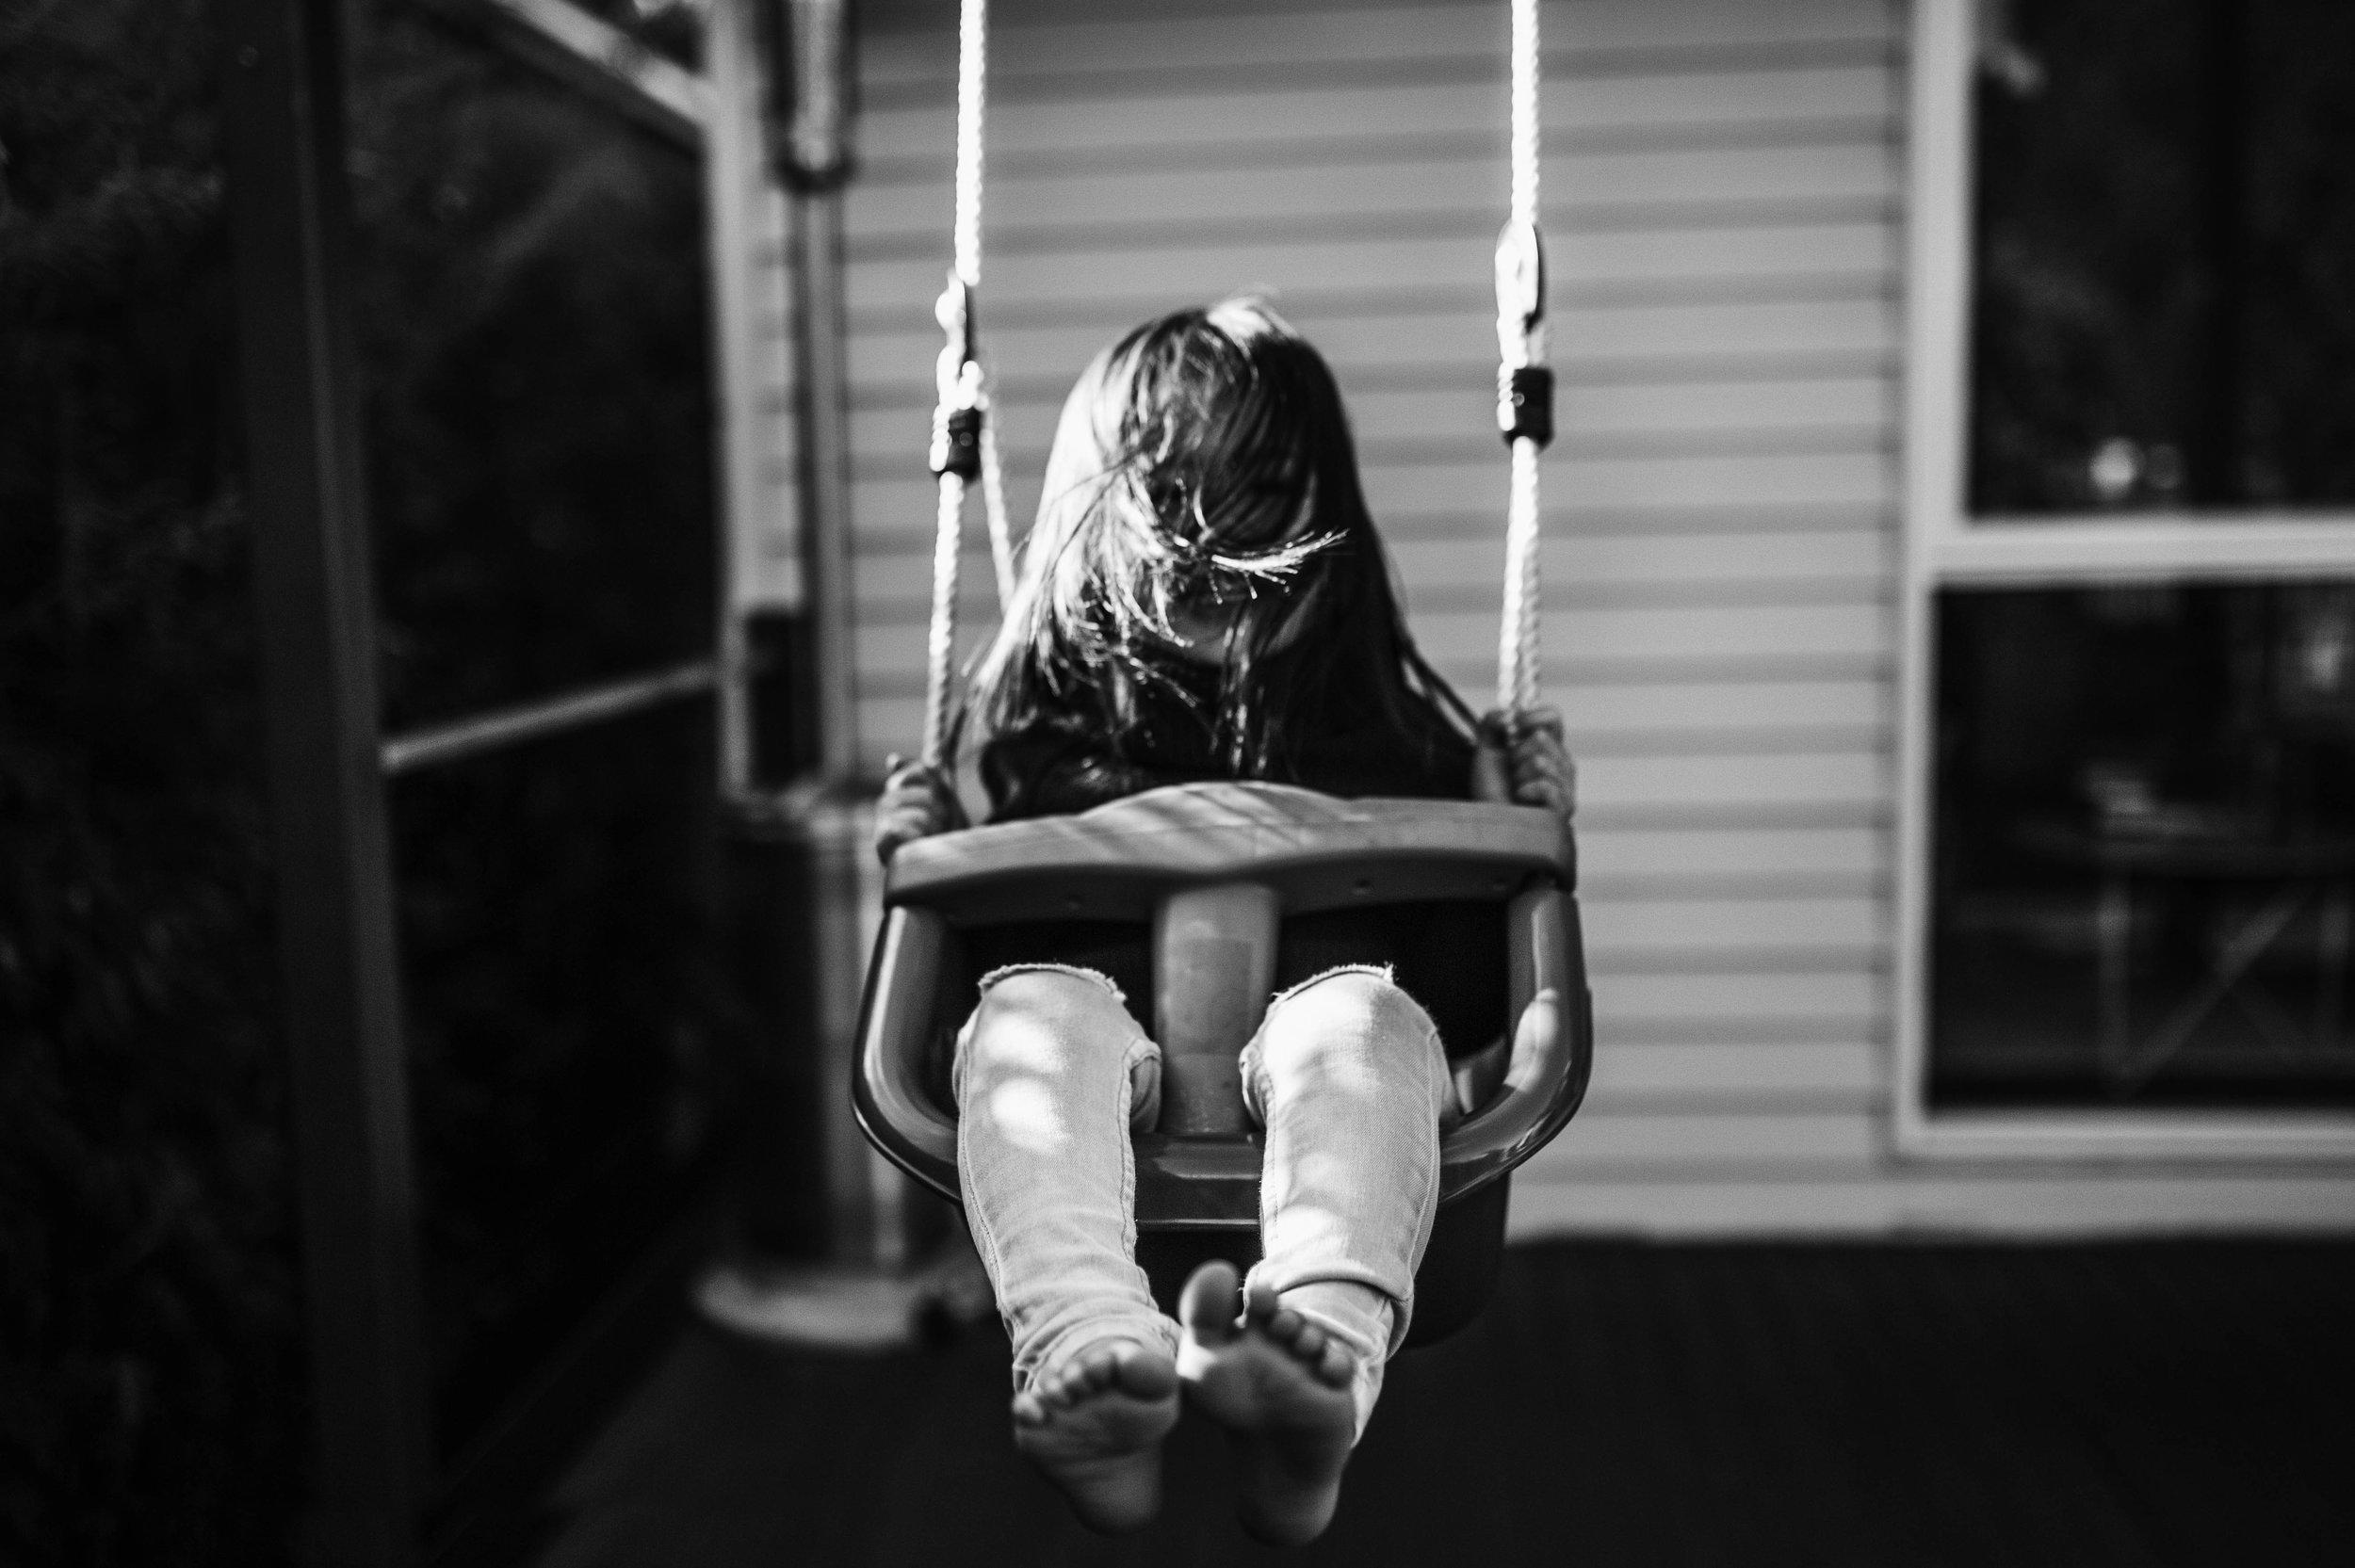 little-girl-on-swing-blur.jpg